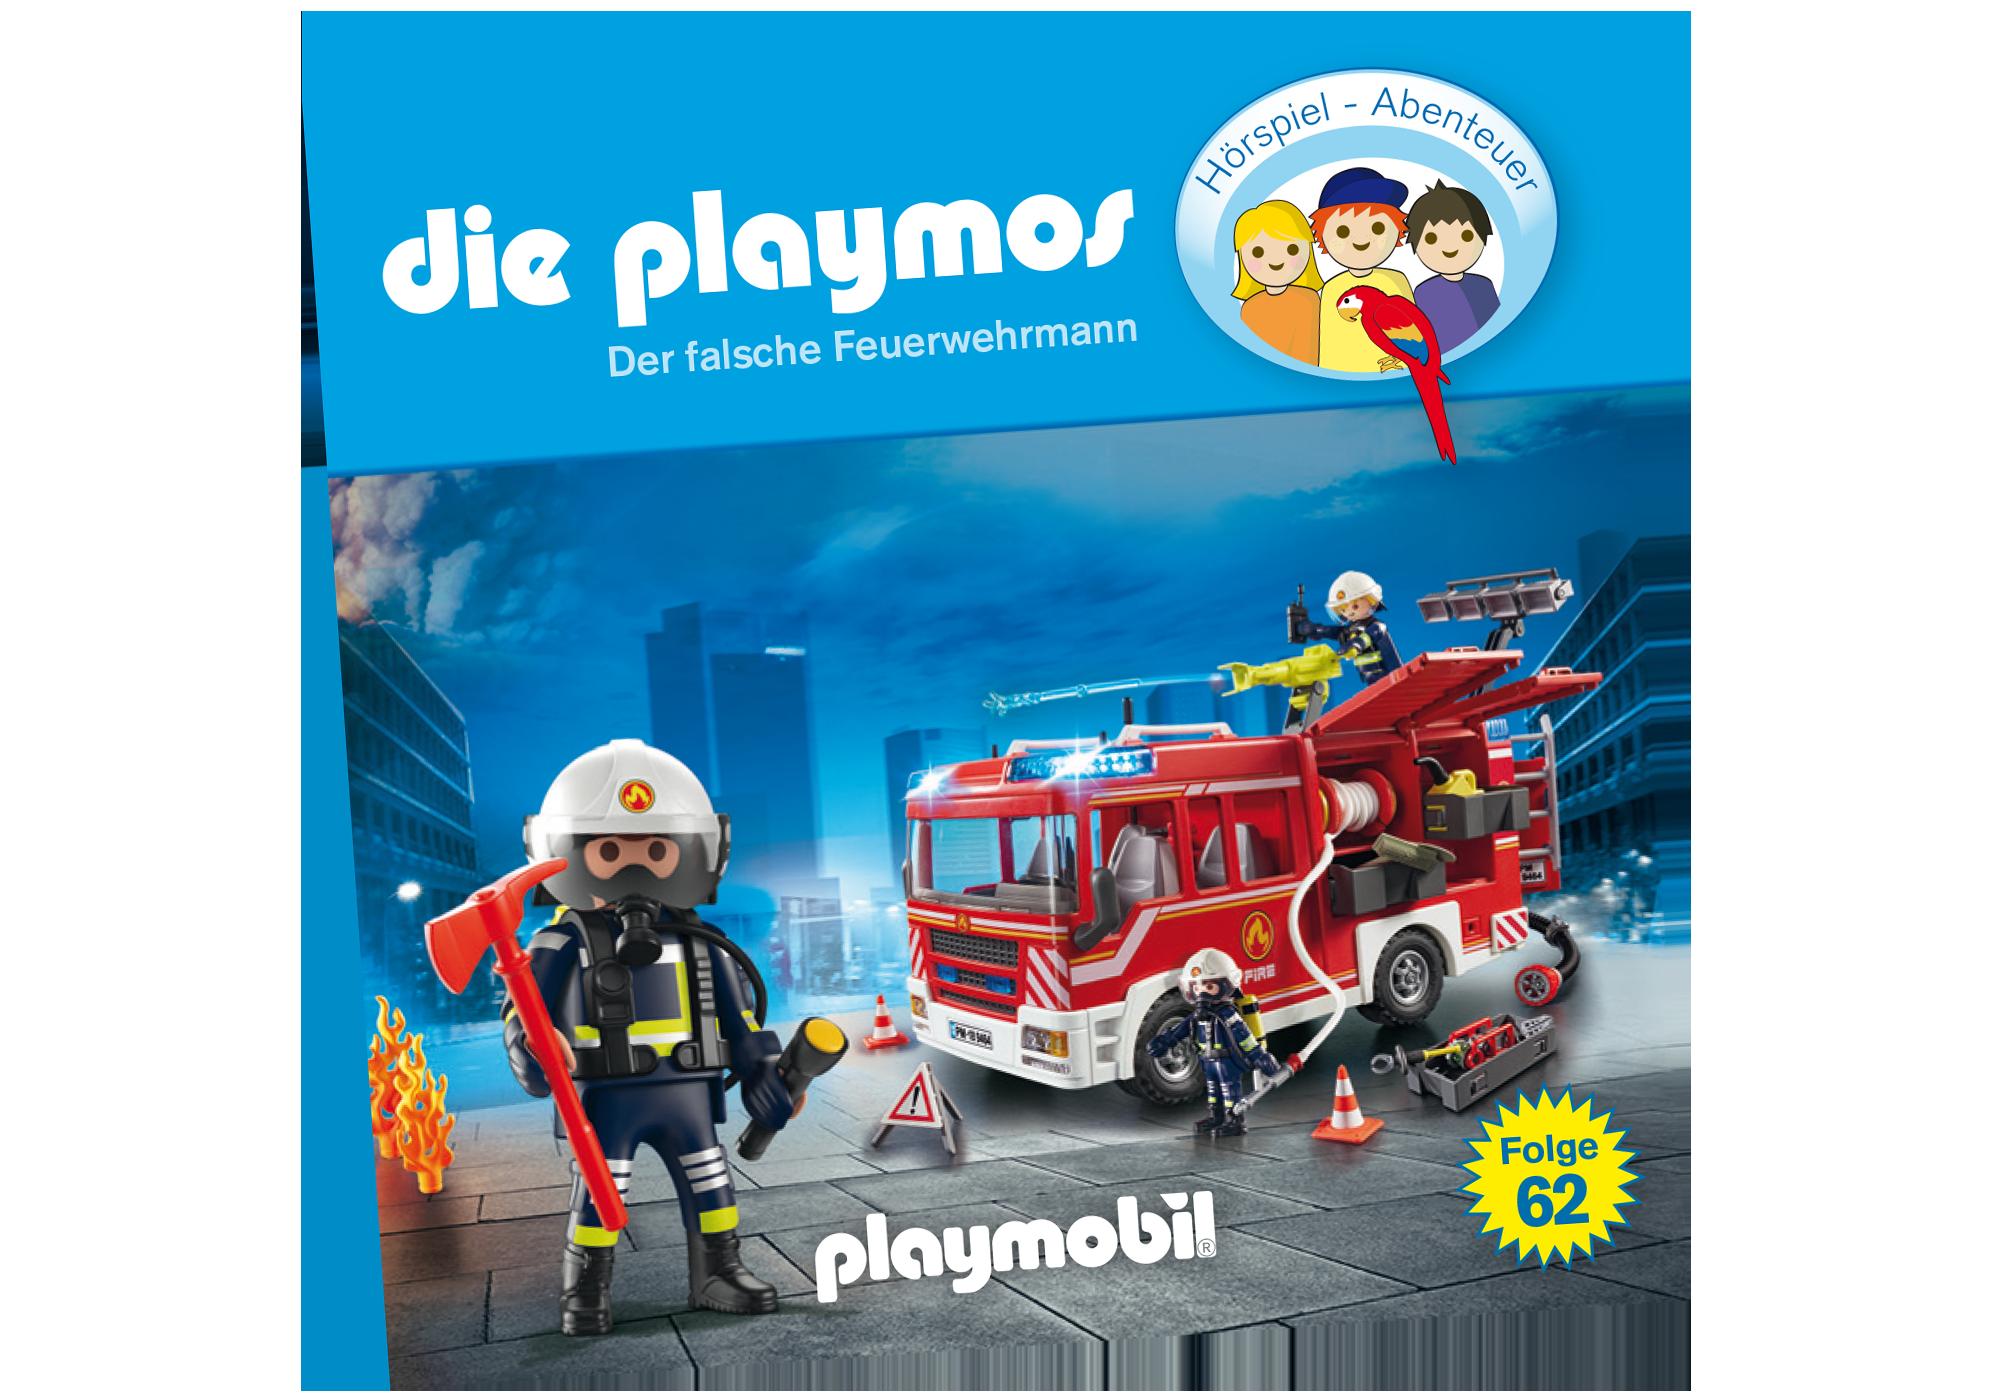 http://media.playmobil.com/i/playmobil/80084_product_detail/Der falsche Feuerwehrmann - Folge 62